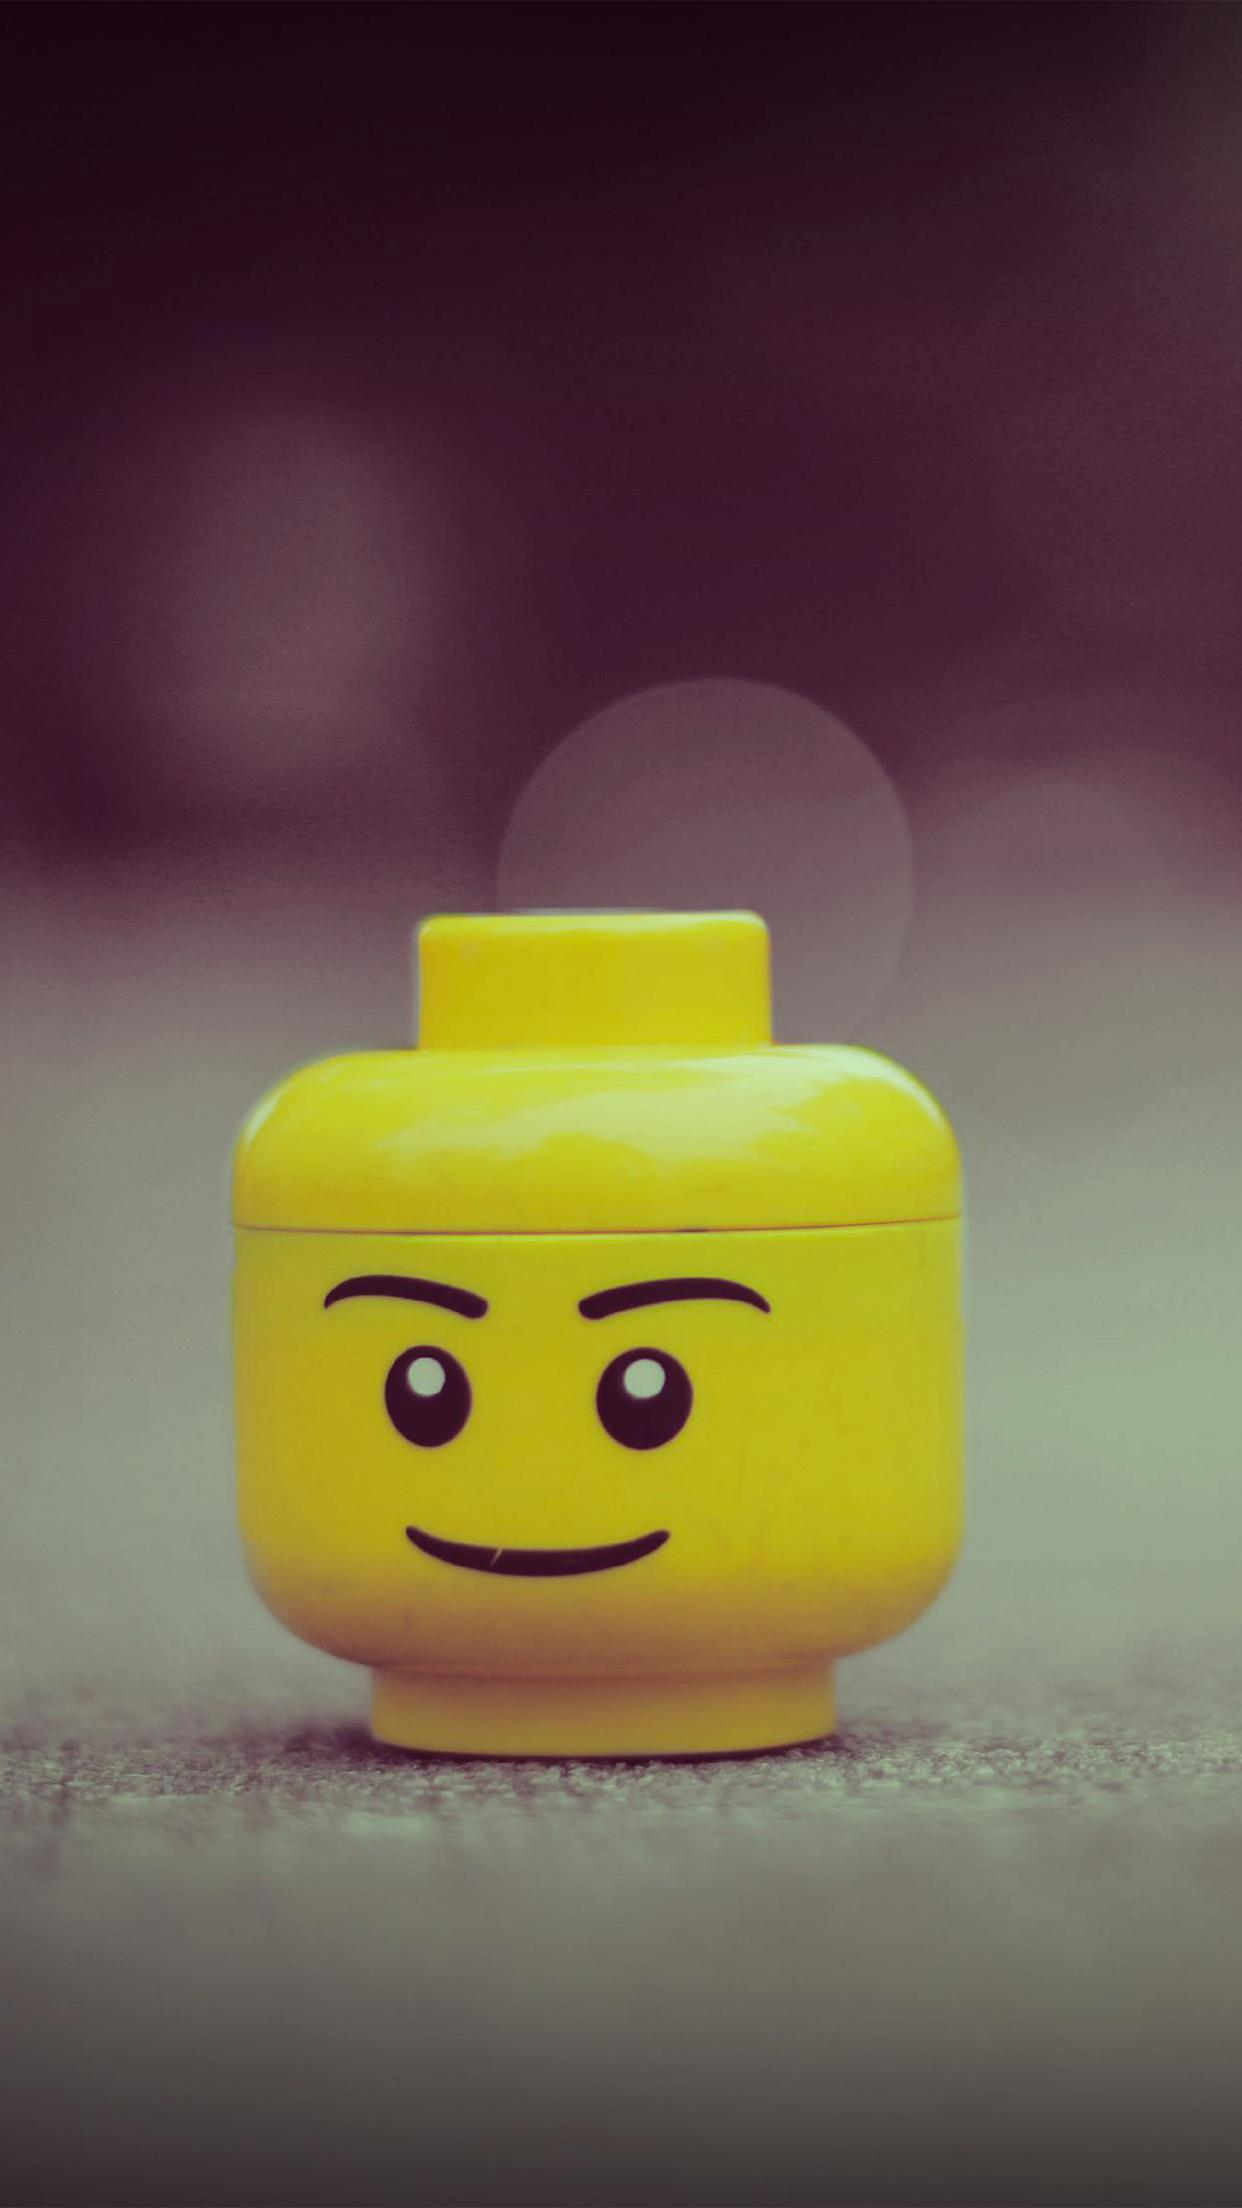 lego head 3wallpapers parallax iPhone Lego head